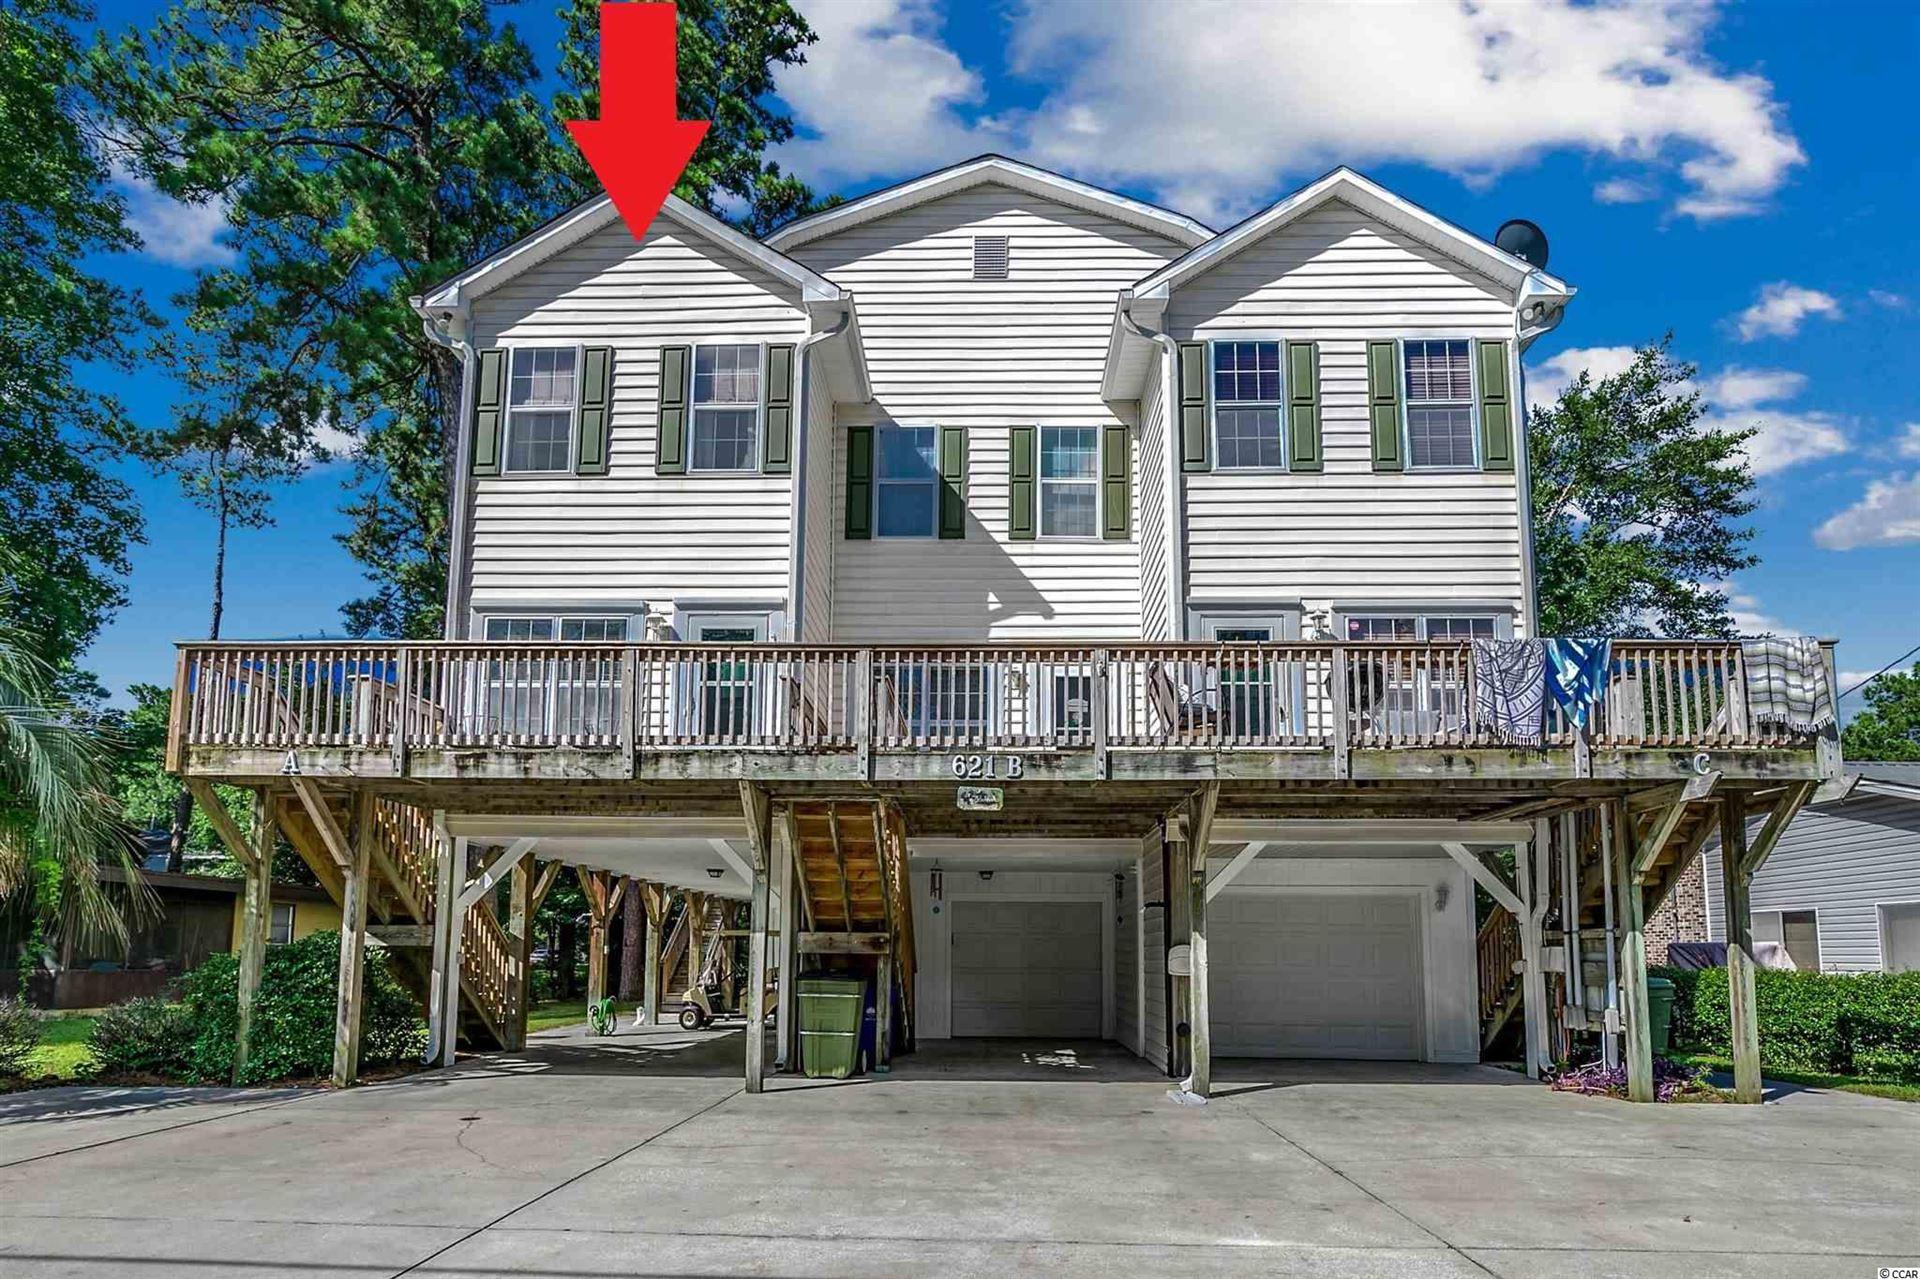 621A 15th Ave. S #A, Surfside Beach, SC 29575 - MLS#: 2115479